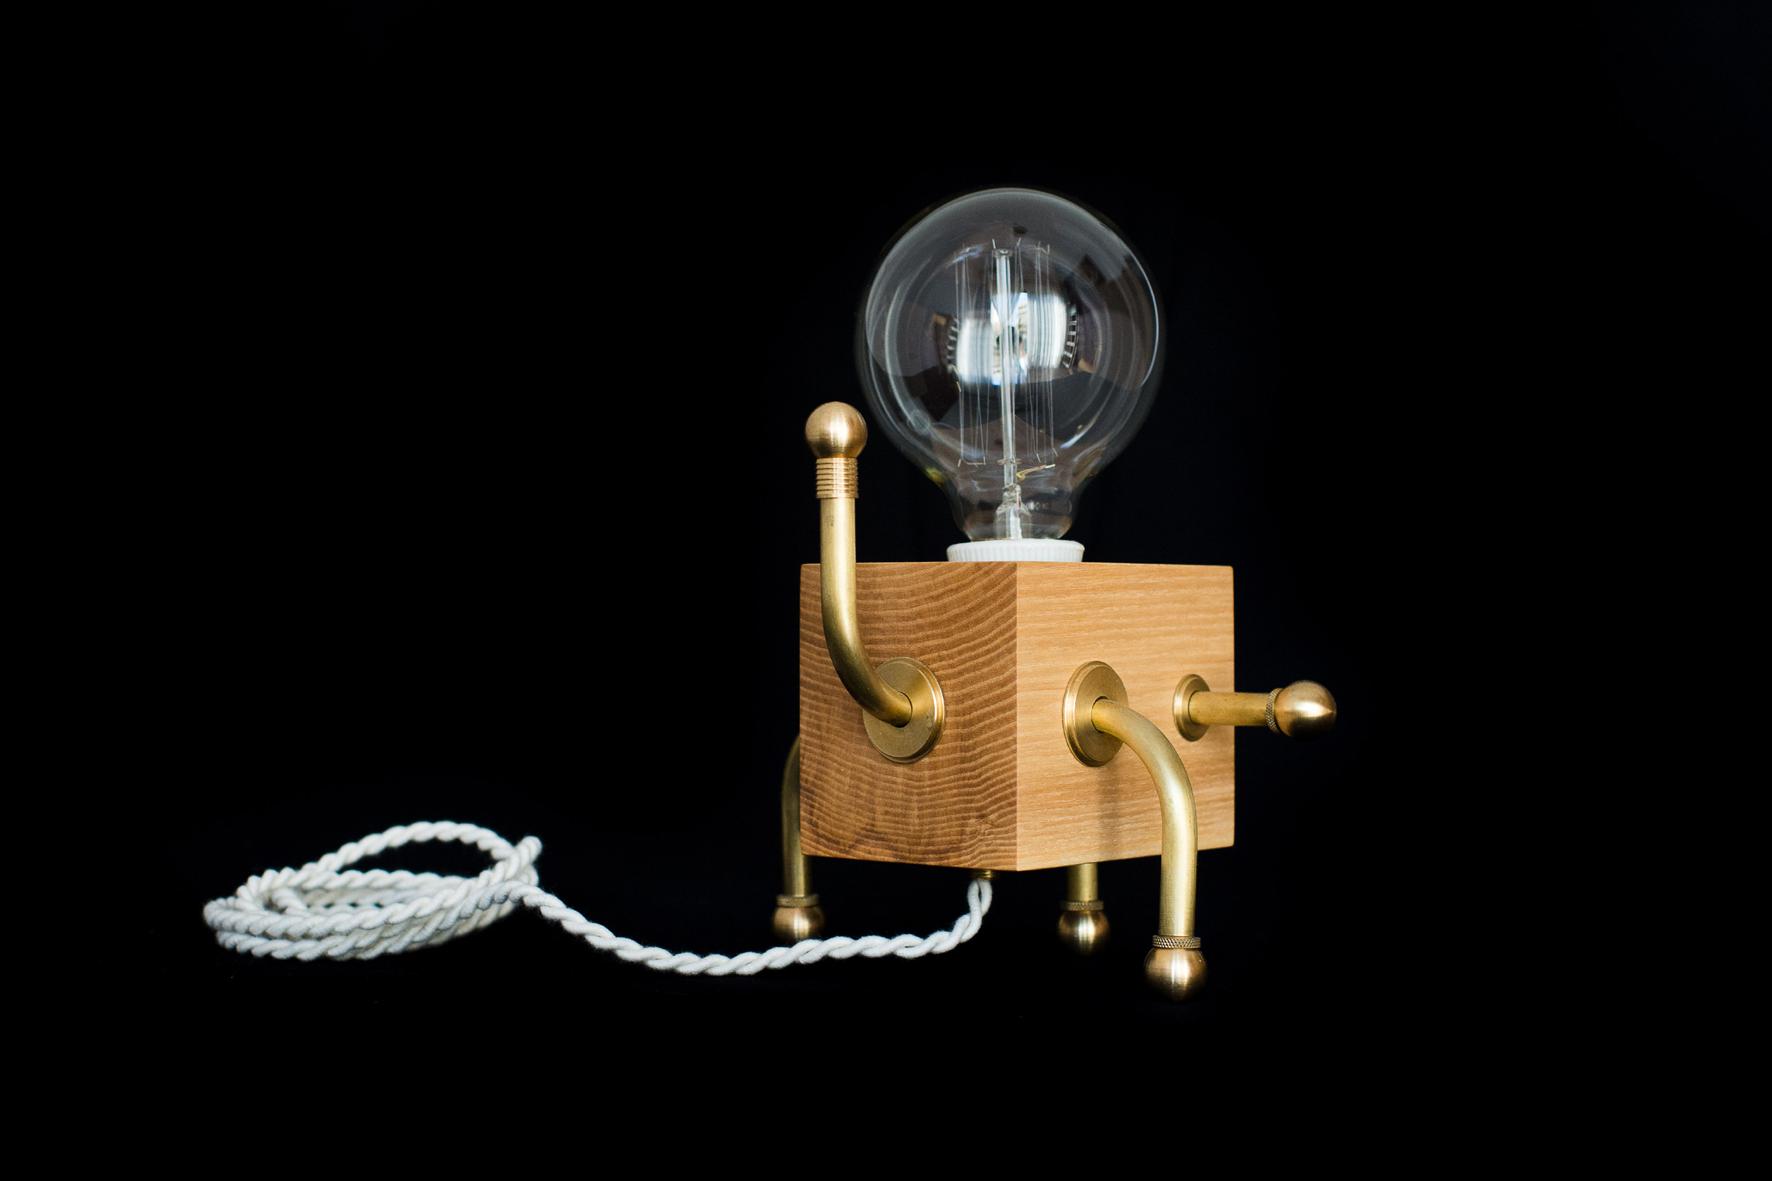 a4_mdba_mdby_manufactured_wood_lamps_antonitoymanolin_frankie